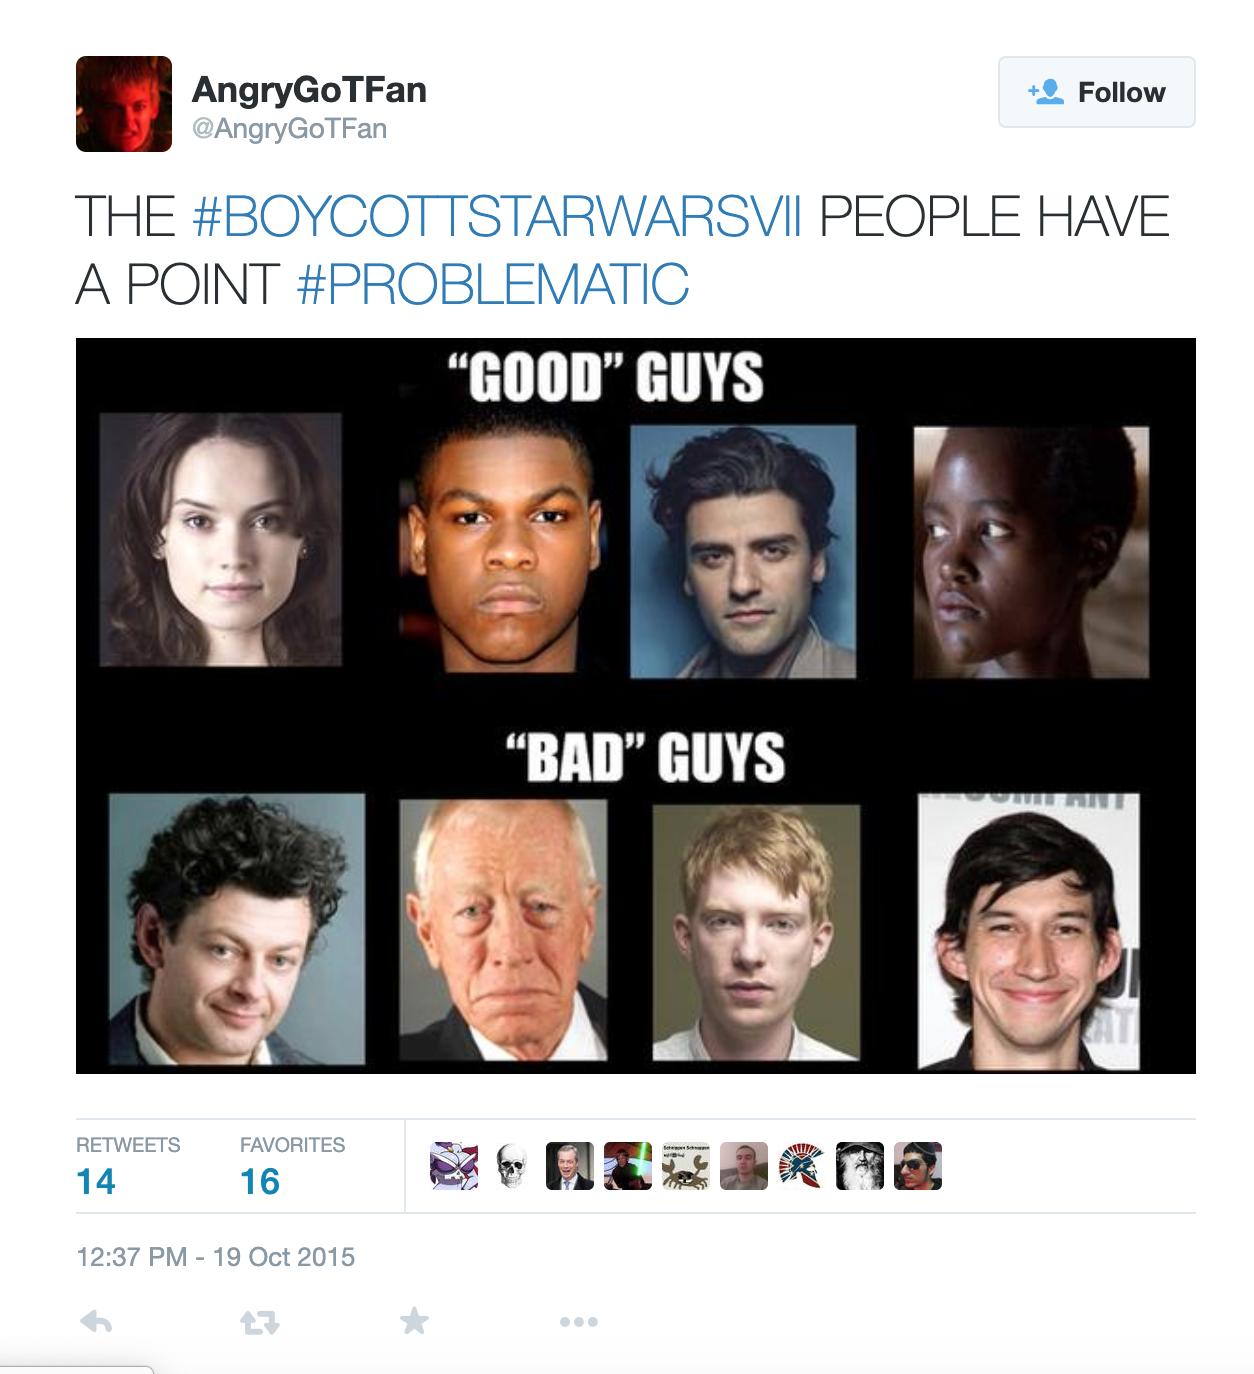 A tweet published Oct. 19, 2015